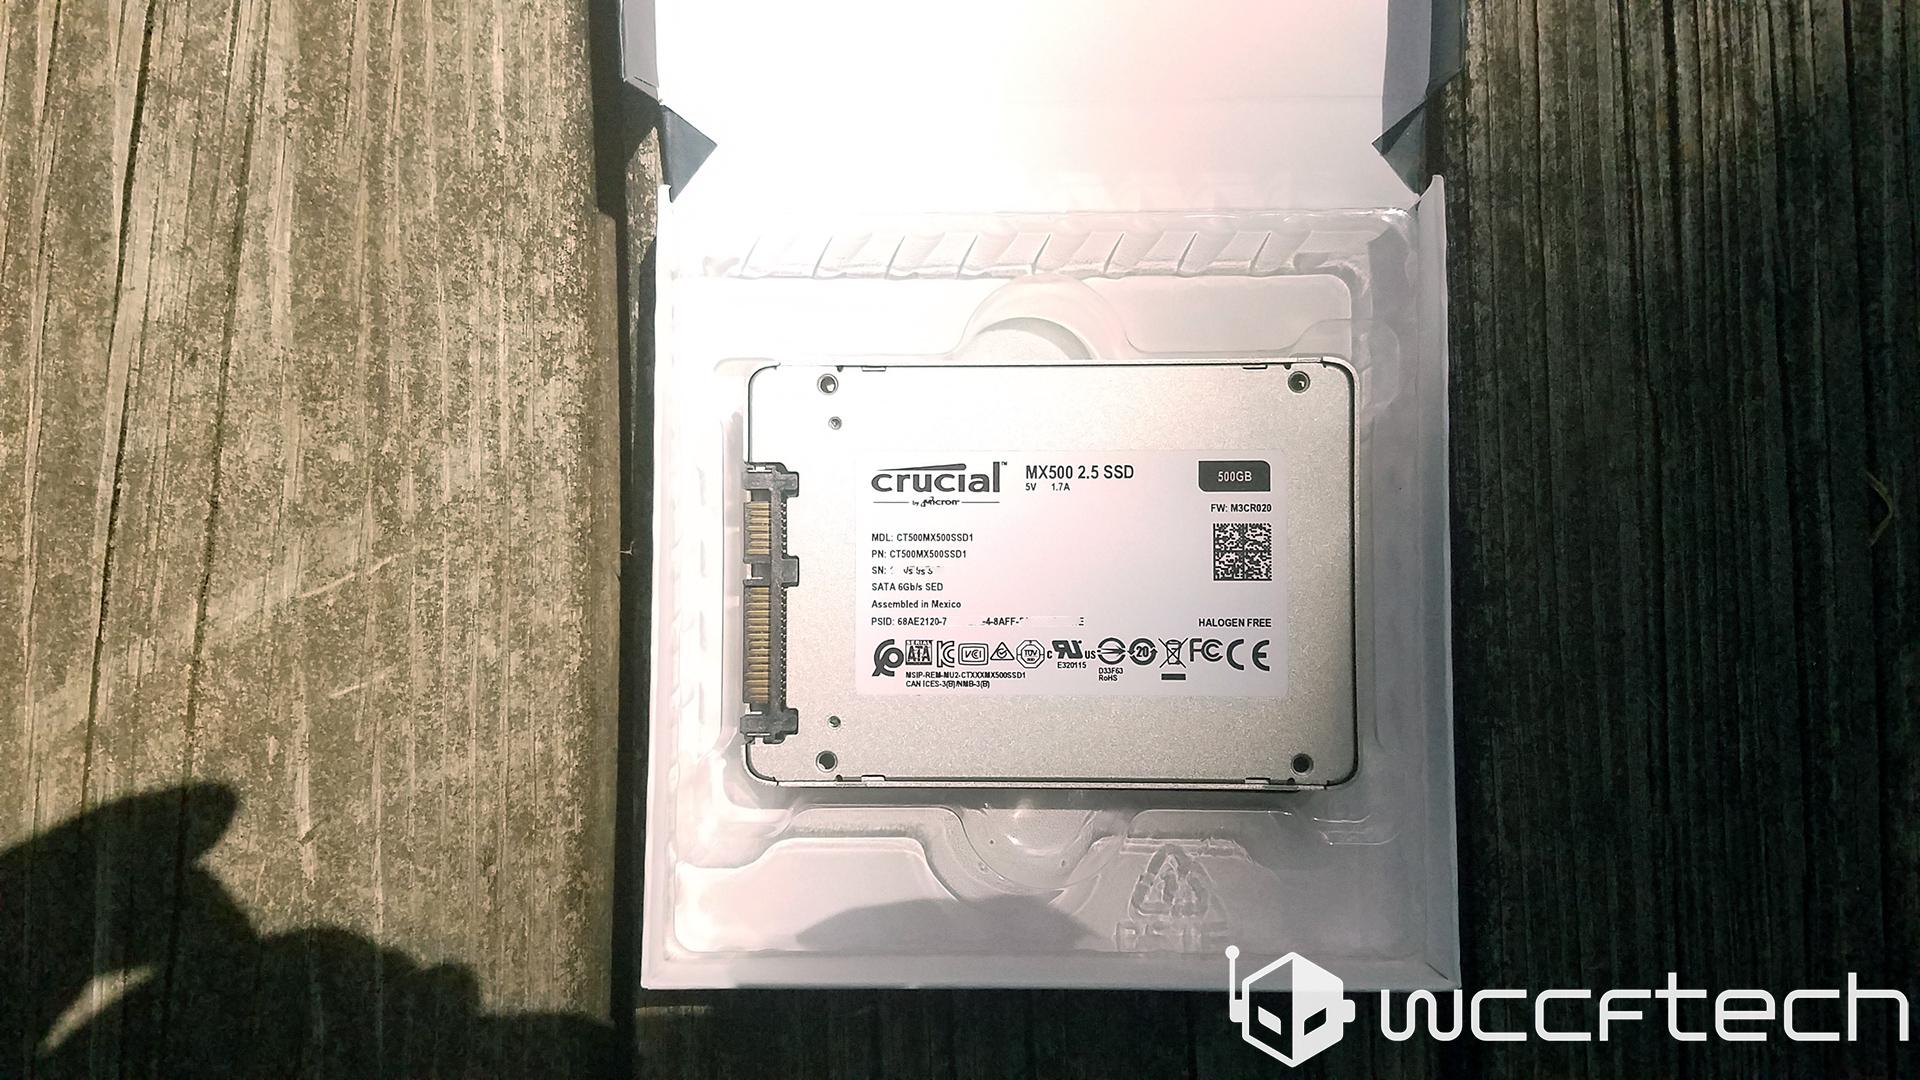 wccftech-crucial-mx500-500gb-sata-drive